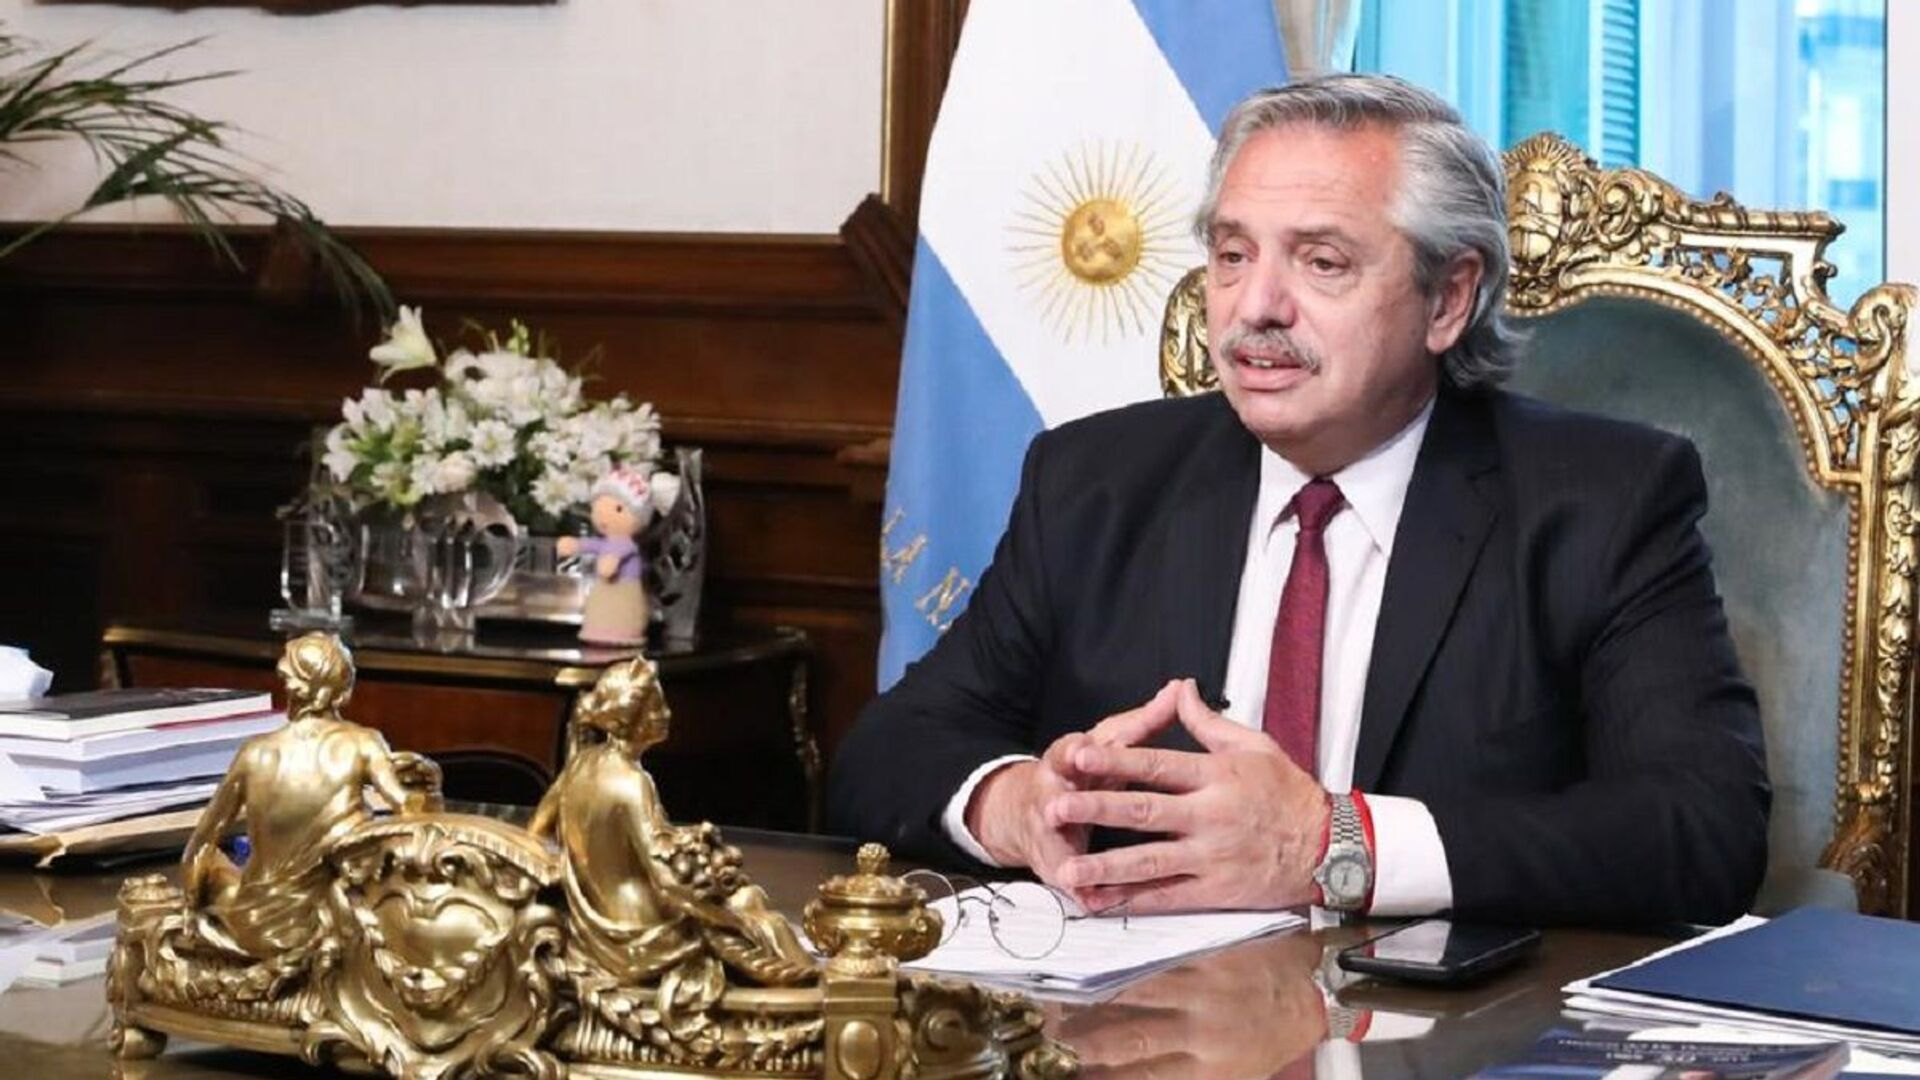 El presidente de Argentina, Alberto Fernández - Sputnik Mundo, 1920, 05.04.2021